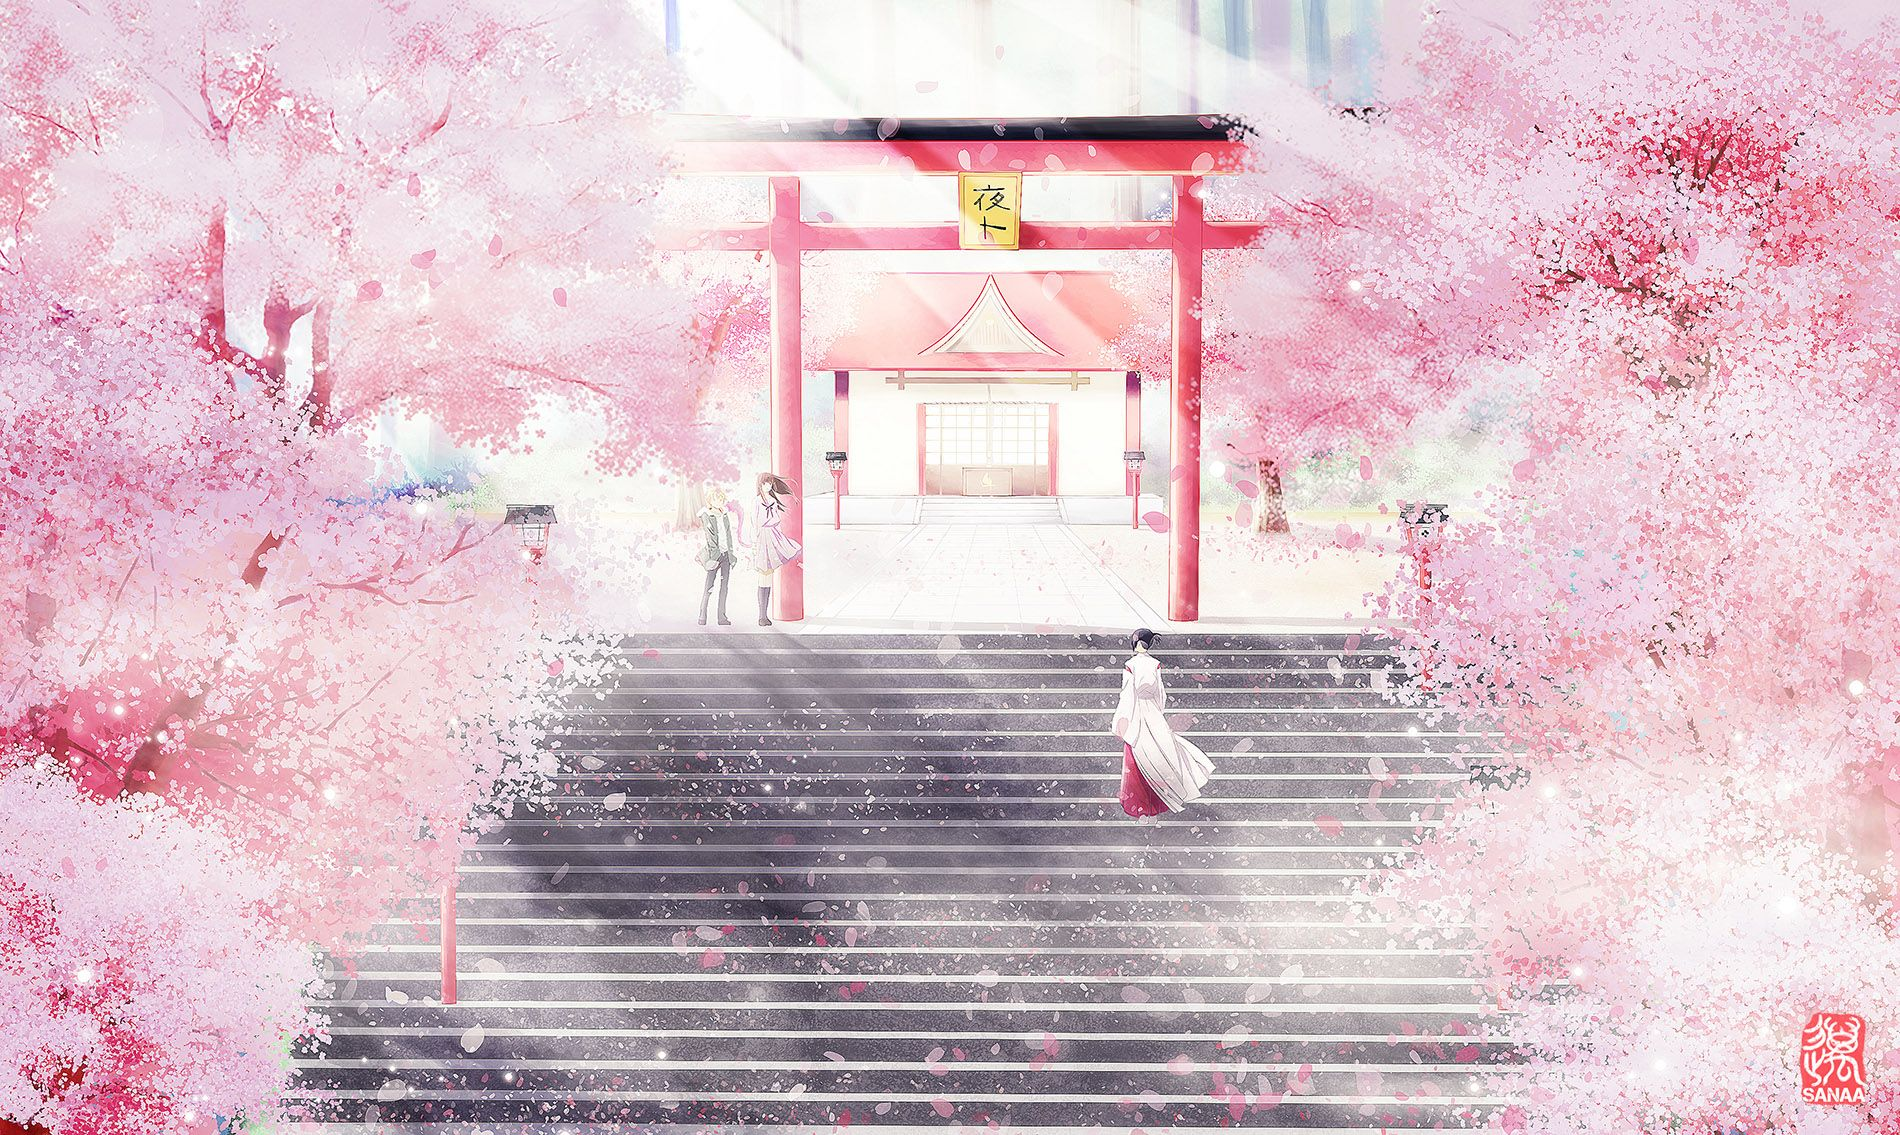 Yato Yukine Computer Wallpapers Desktop Backgrounds 1900x1135 Id 681358 Anime Cherry Blossom Cherry Blossom Wallpaper Anime Backgrounds Wallpapers